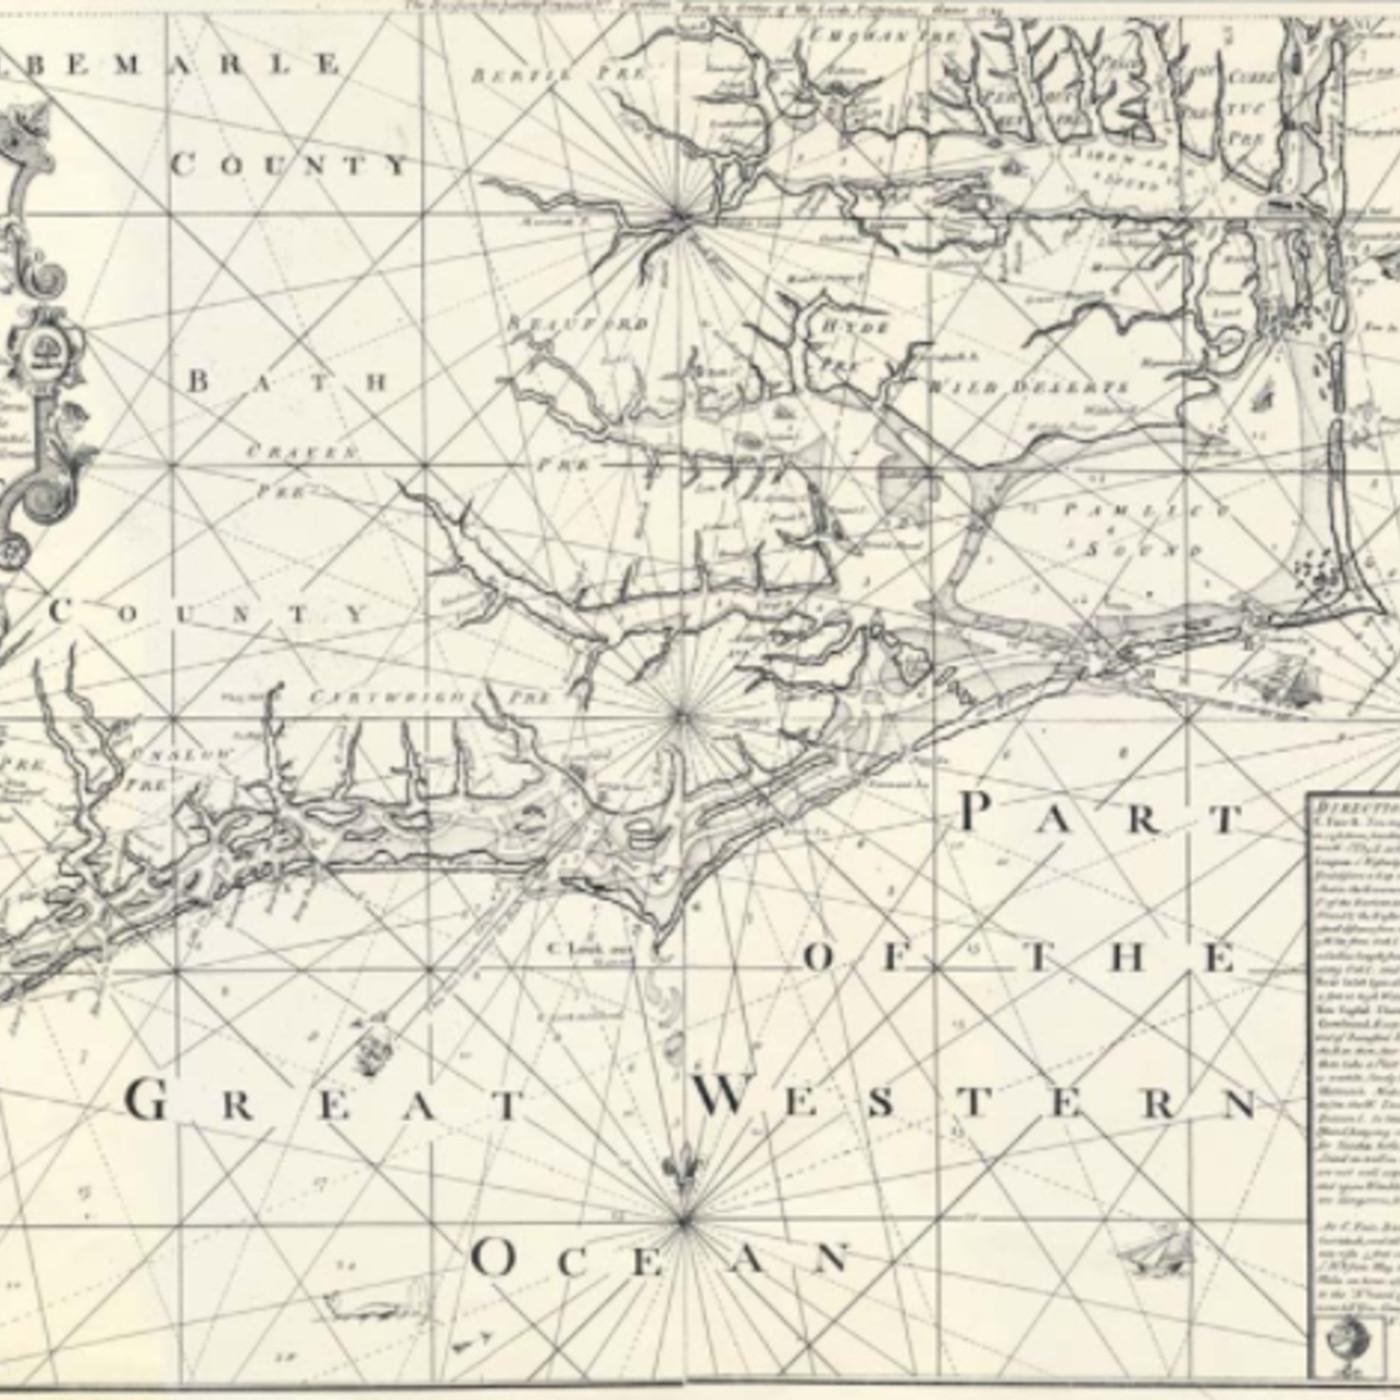 295 - Swamp People of Carolina (Live)